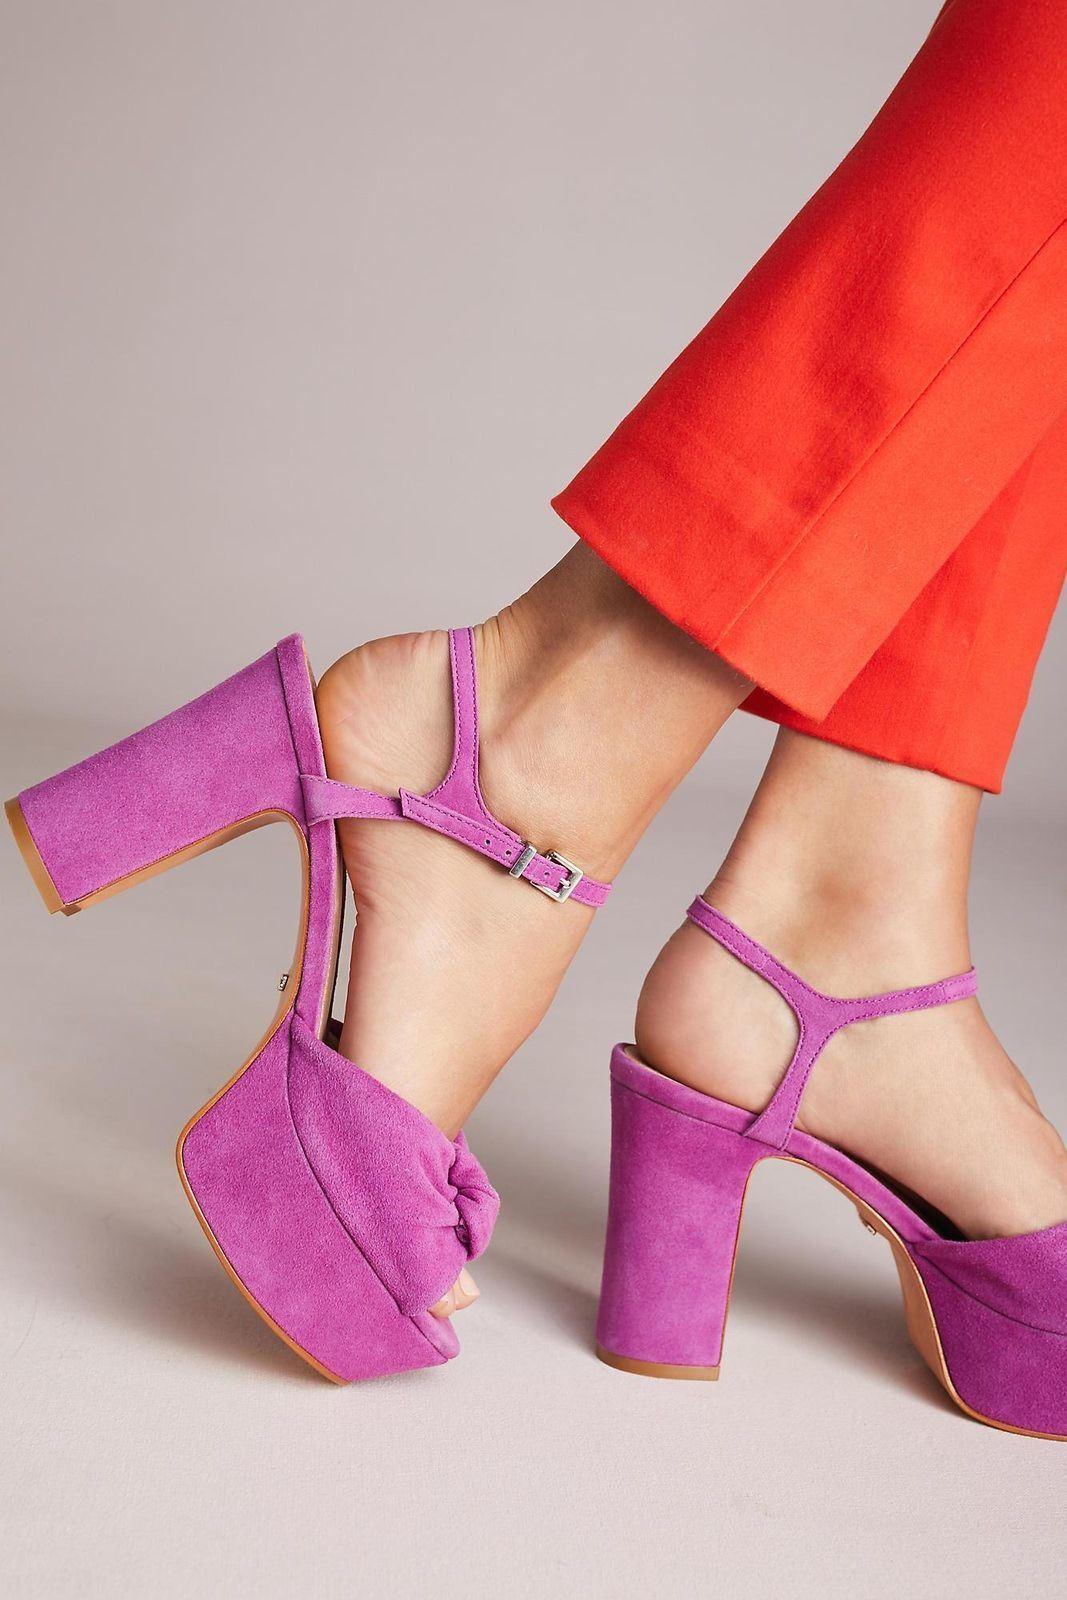 SCHUTZ Thalyta Platform Grape Purple Suede Retro Ankle Strap Flatform Sandales